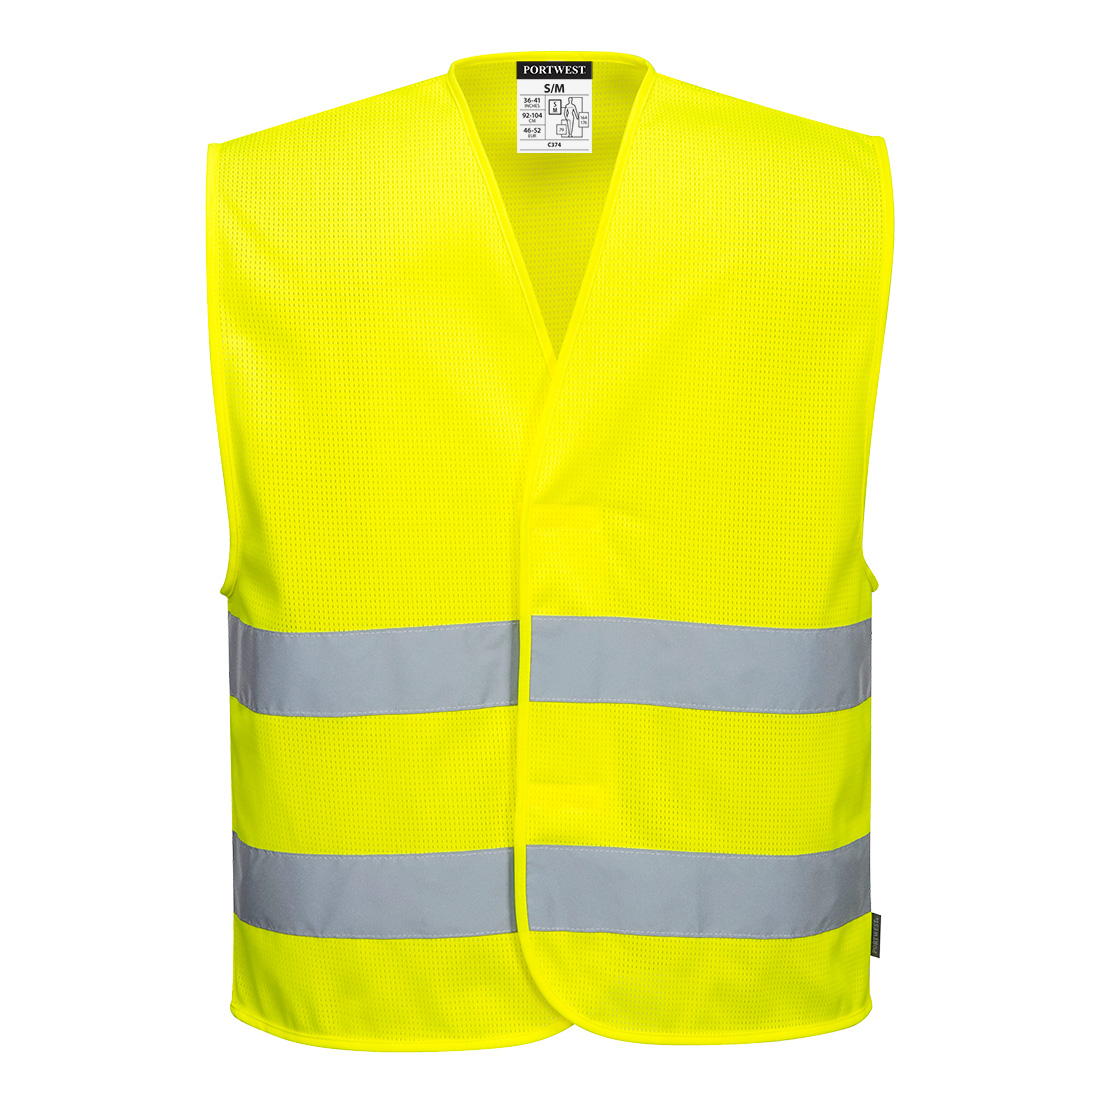 MeshAir Hi-Vis 2 Band Vest Yellow 4X5XR